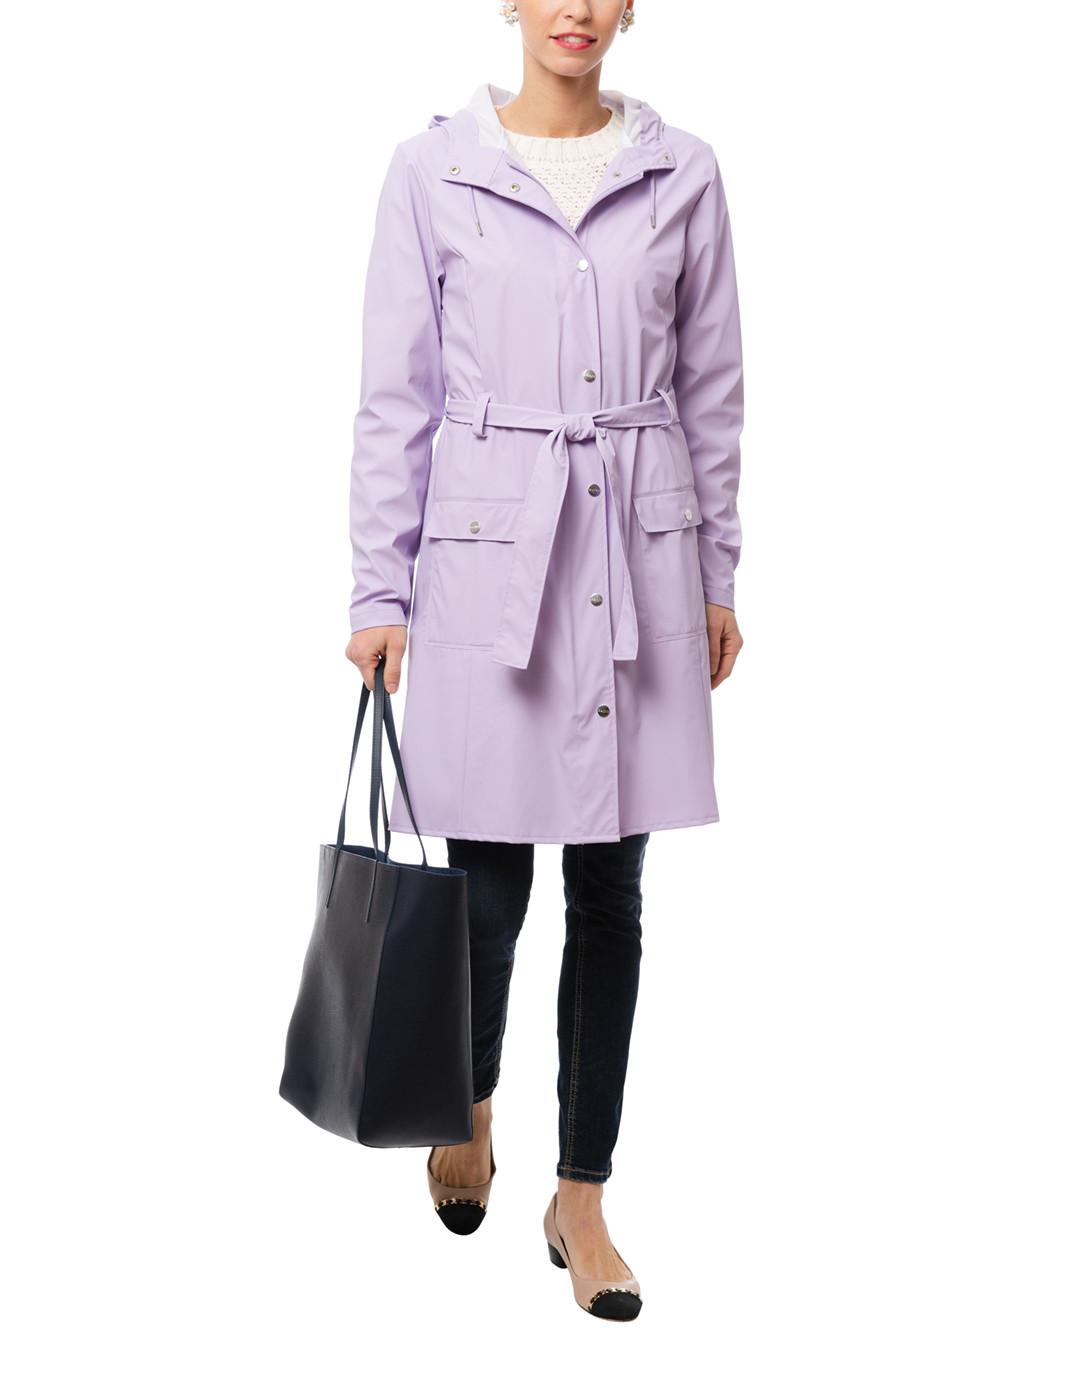 603de751a1f5 Lavender Curve Waterproof Raincoat | Rains | Halsbrook